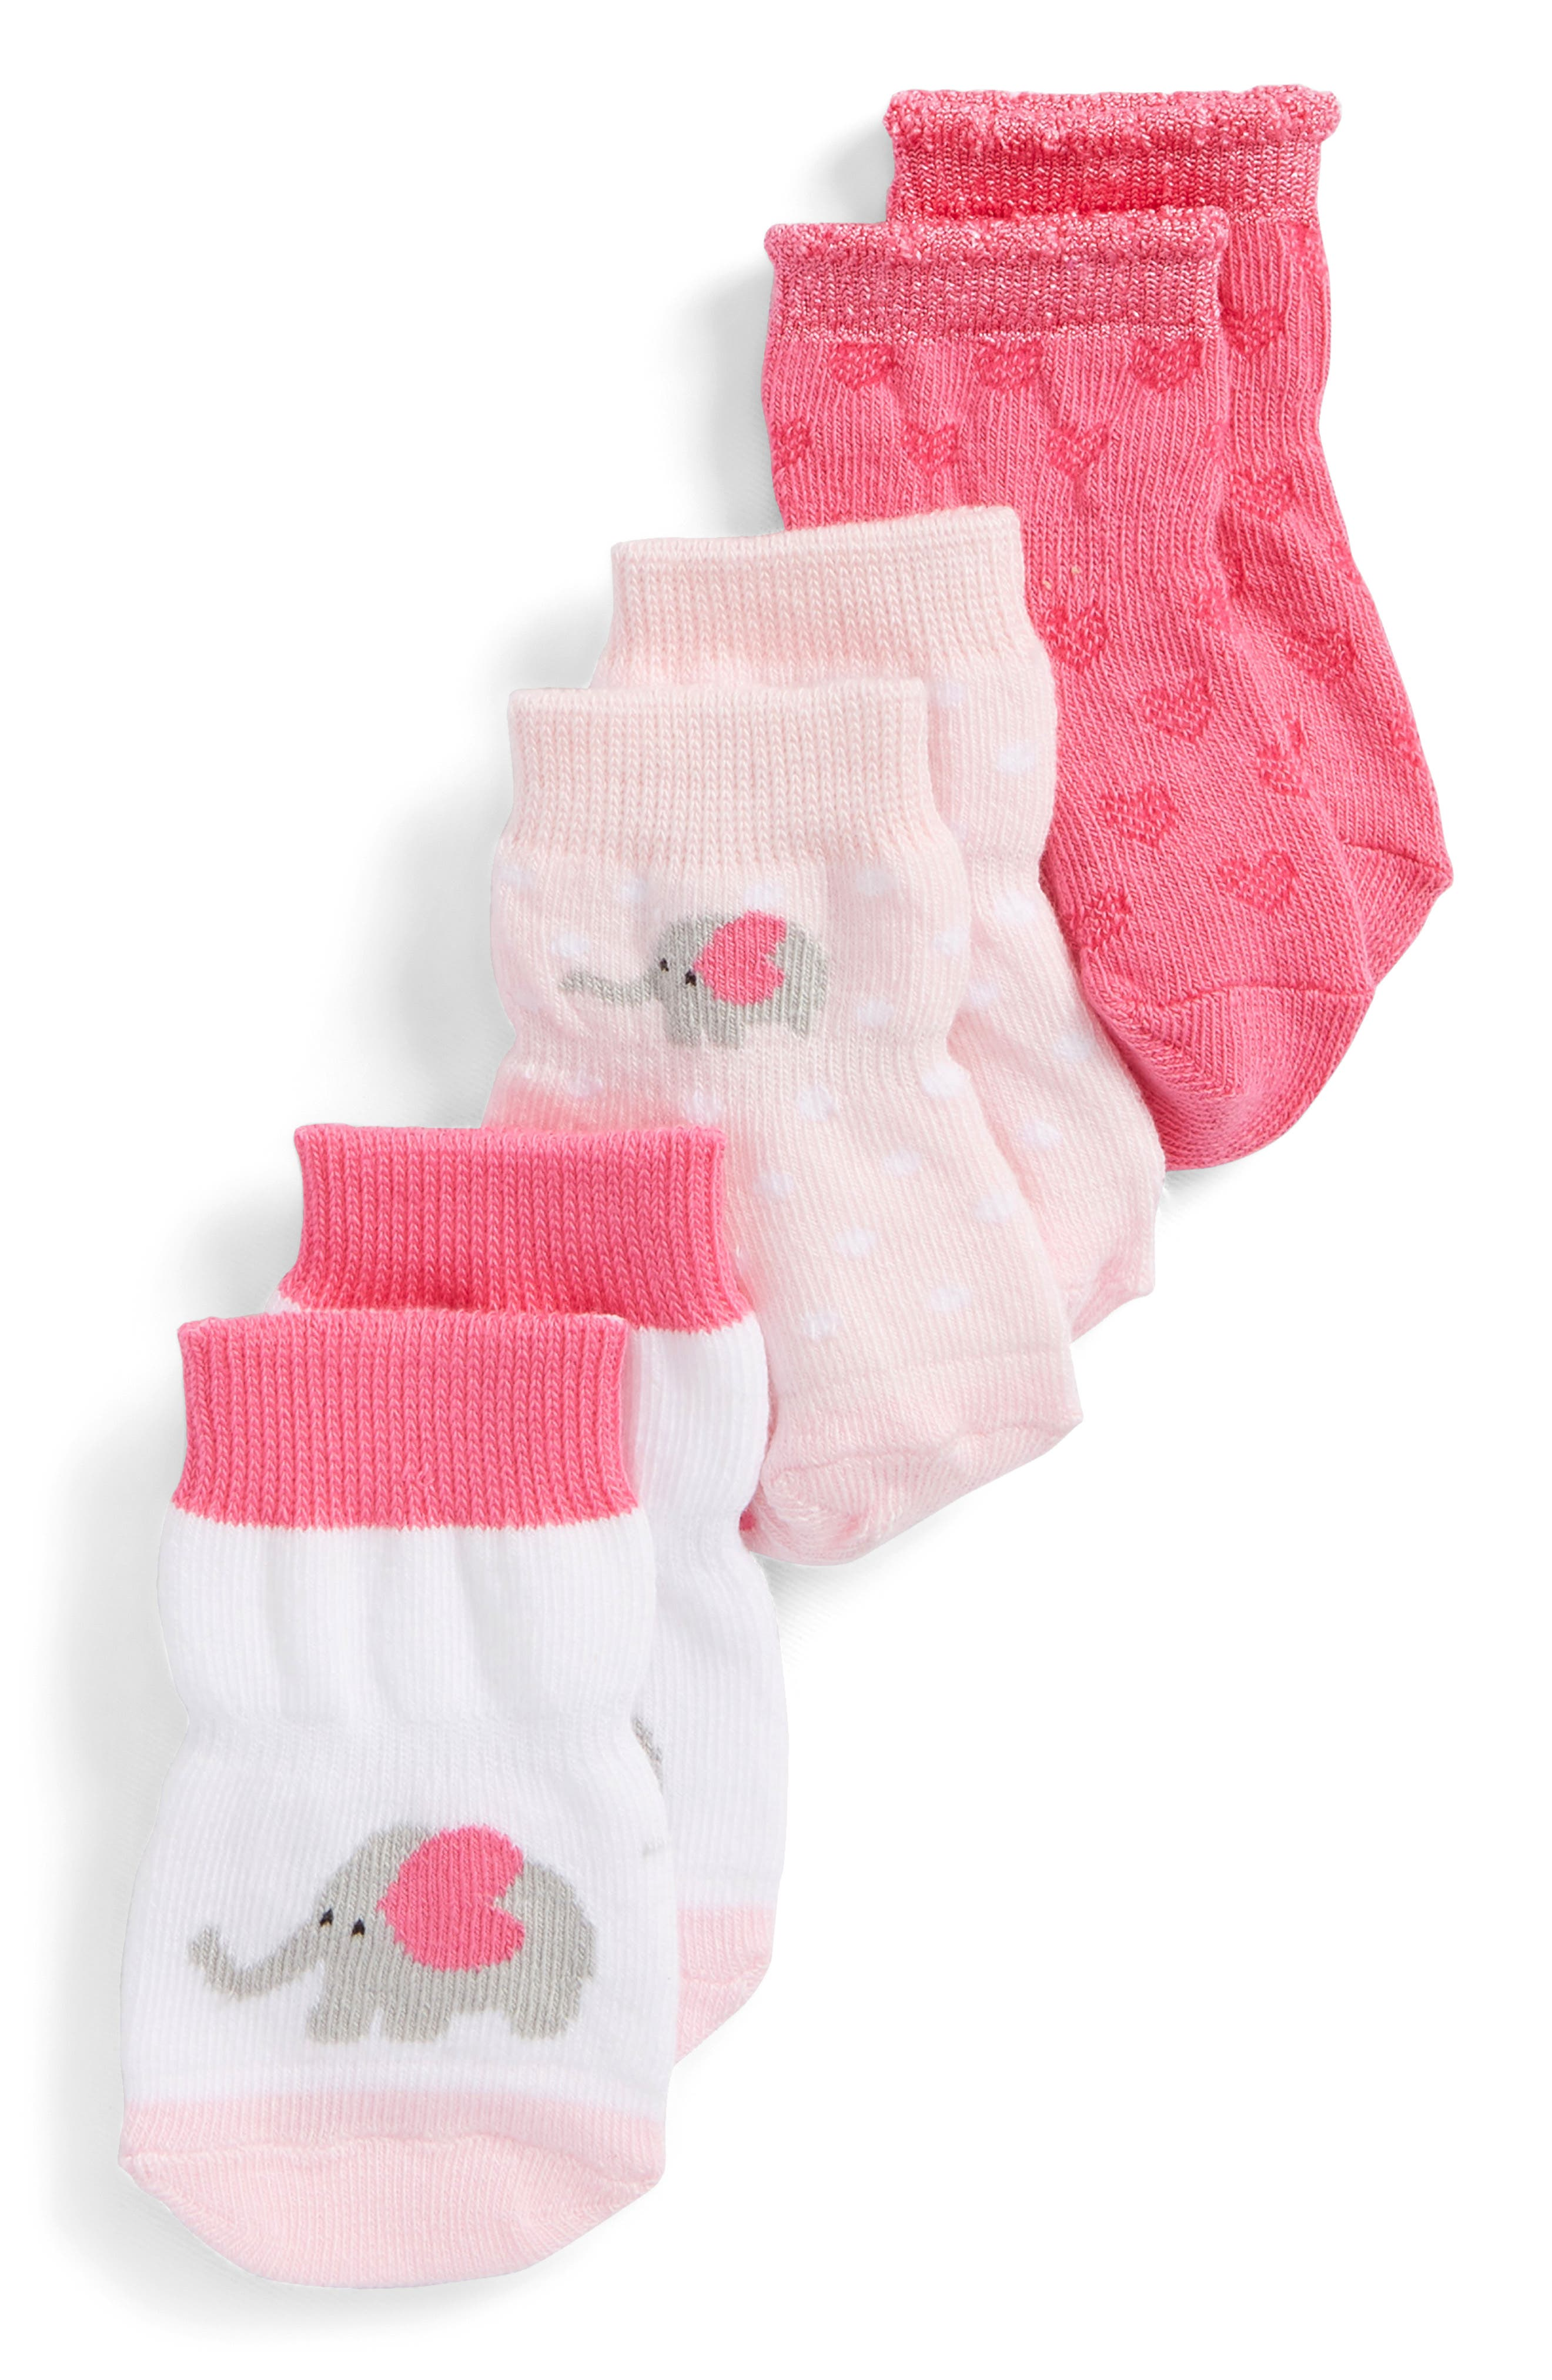 Little Peanut 3-Pack Socks,                             Main thumbnail 1, color,                             Pink/ White